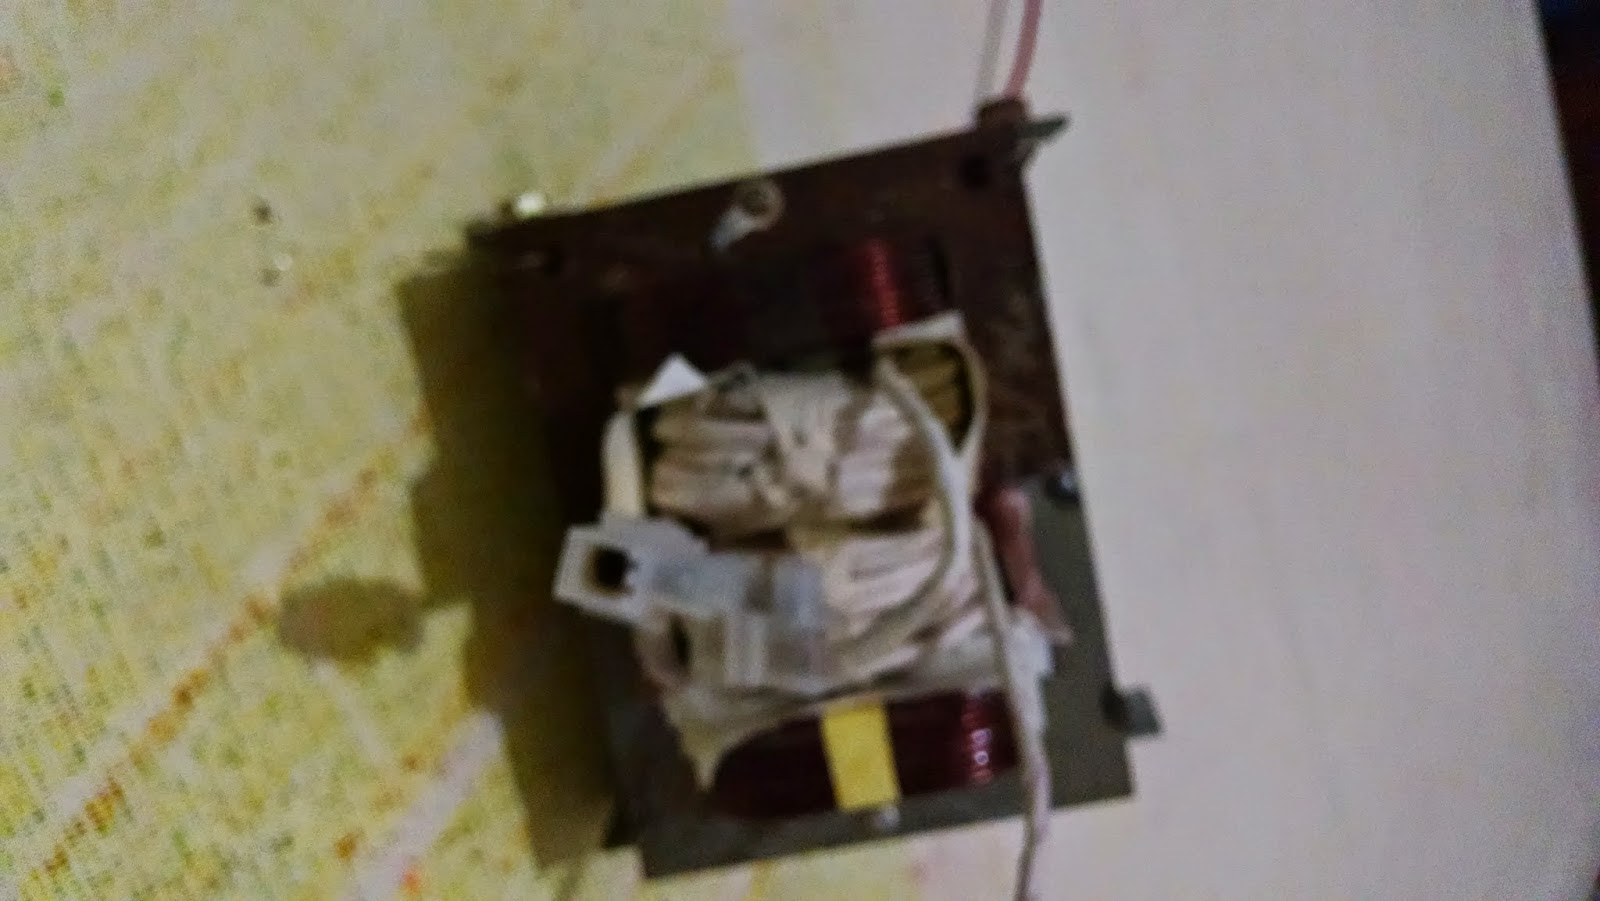 Transformador principal da máquina de solda caseira.